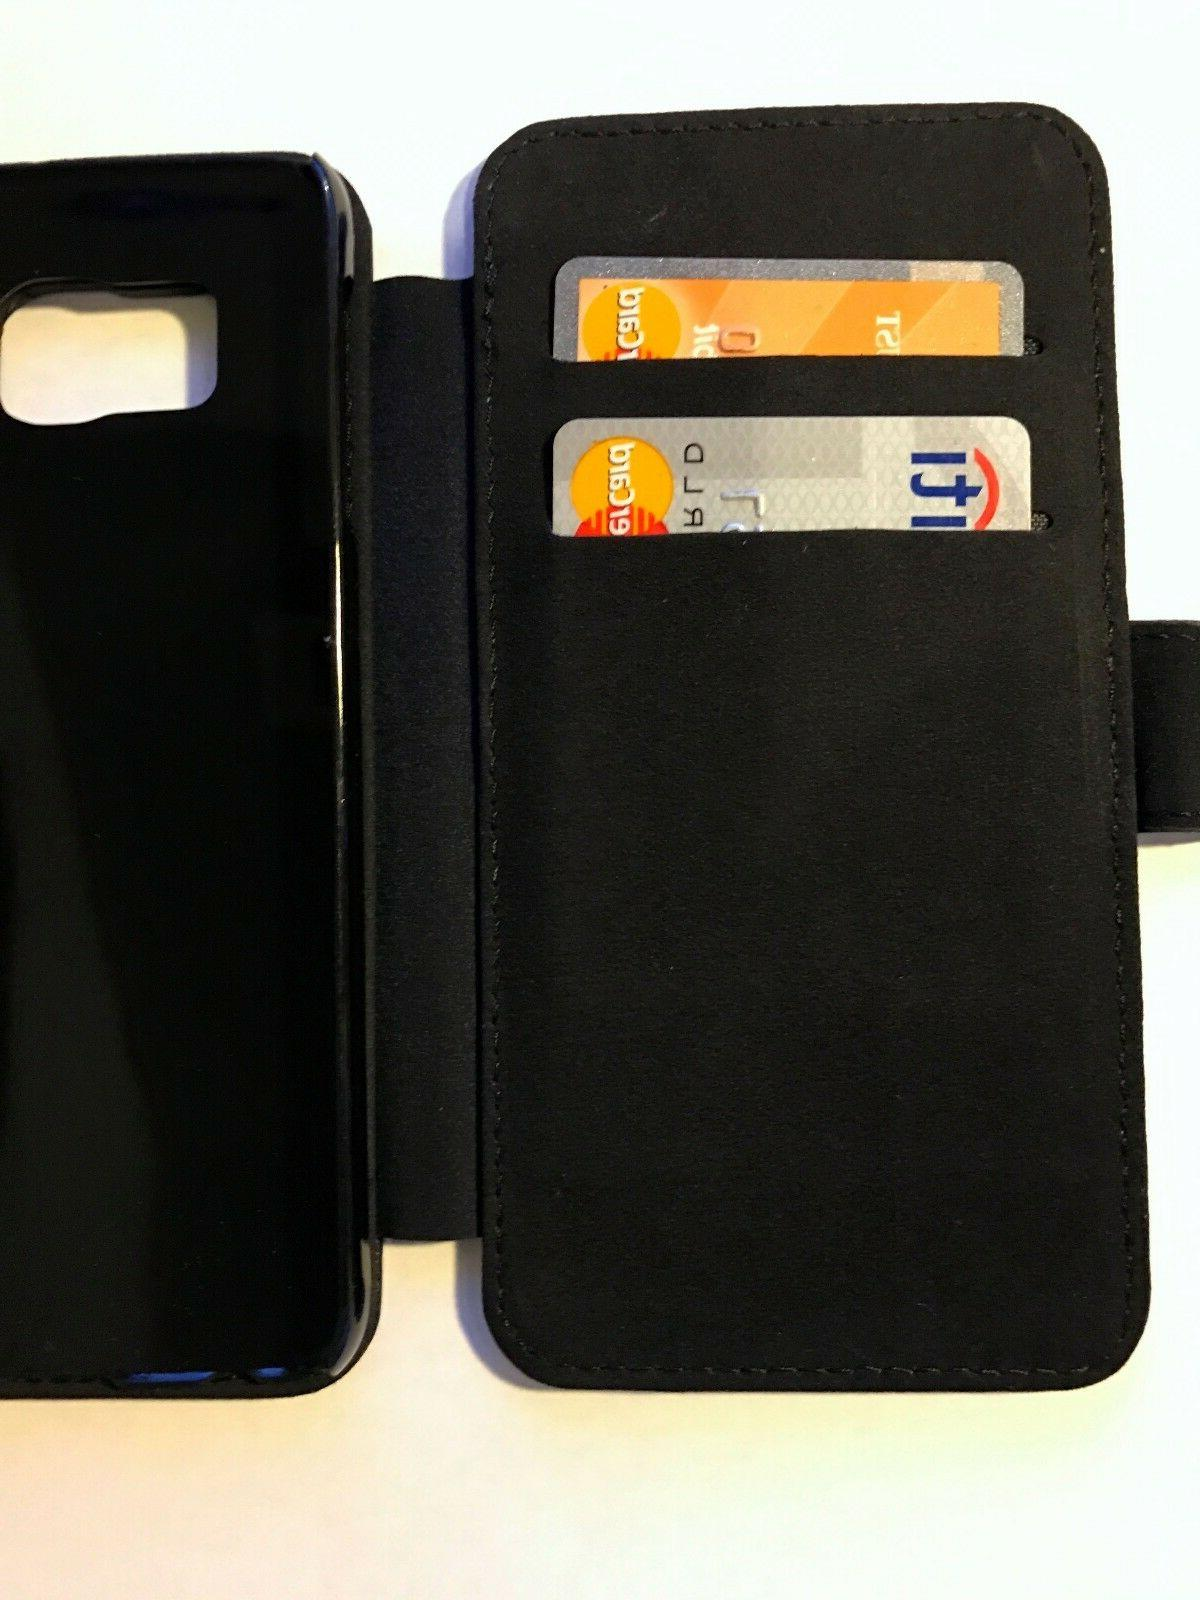 MIAMI PHONE CASE FOR SAMSUNG LG